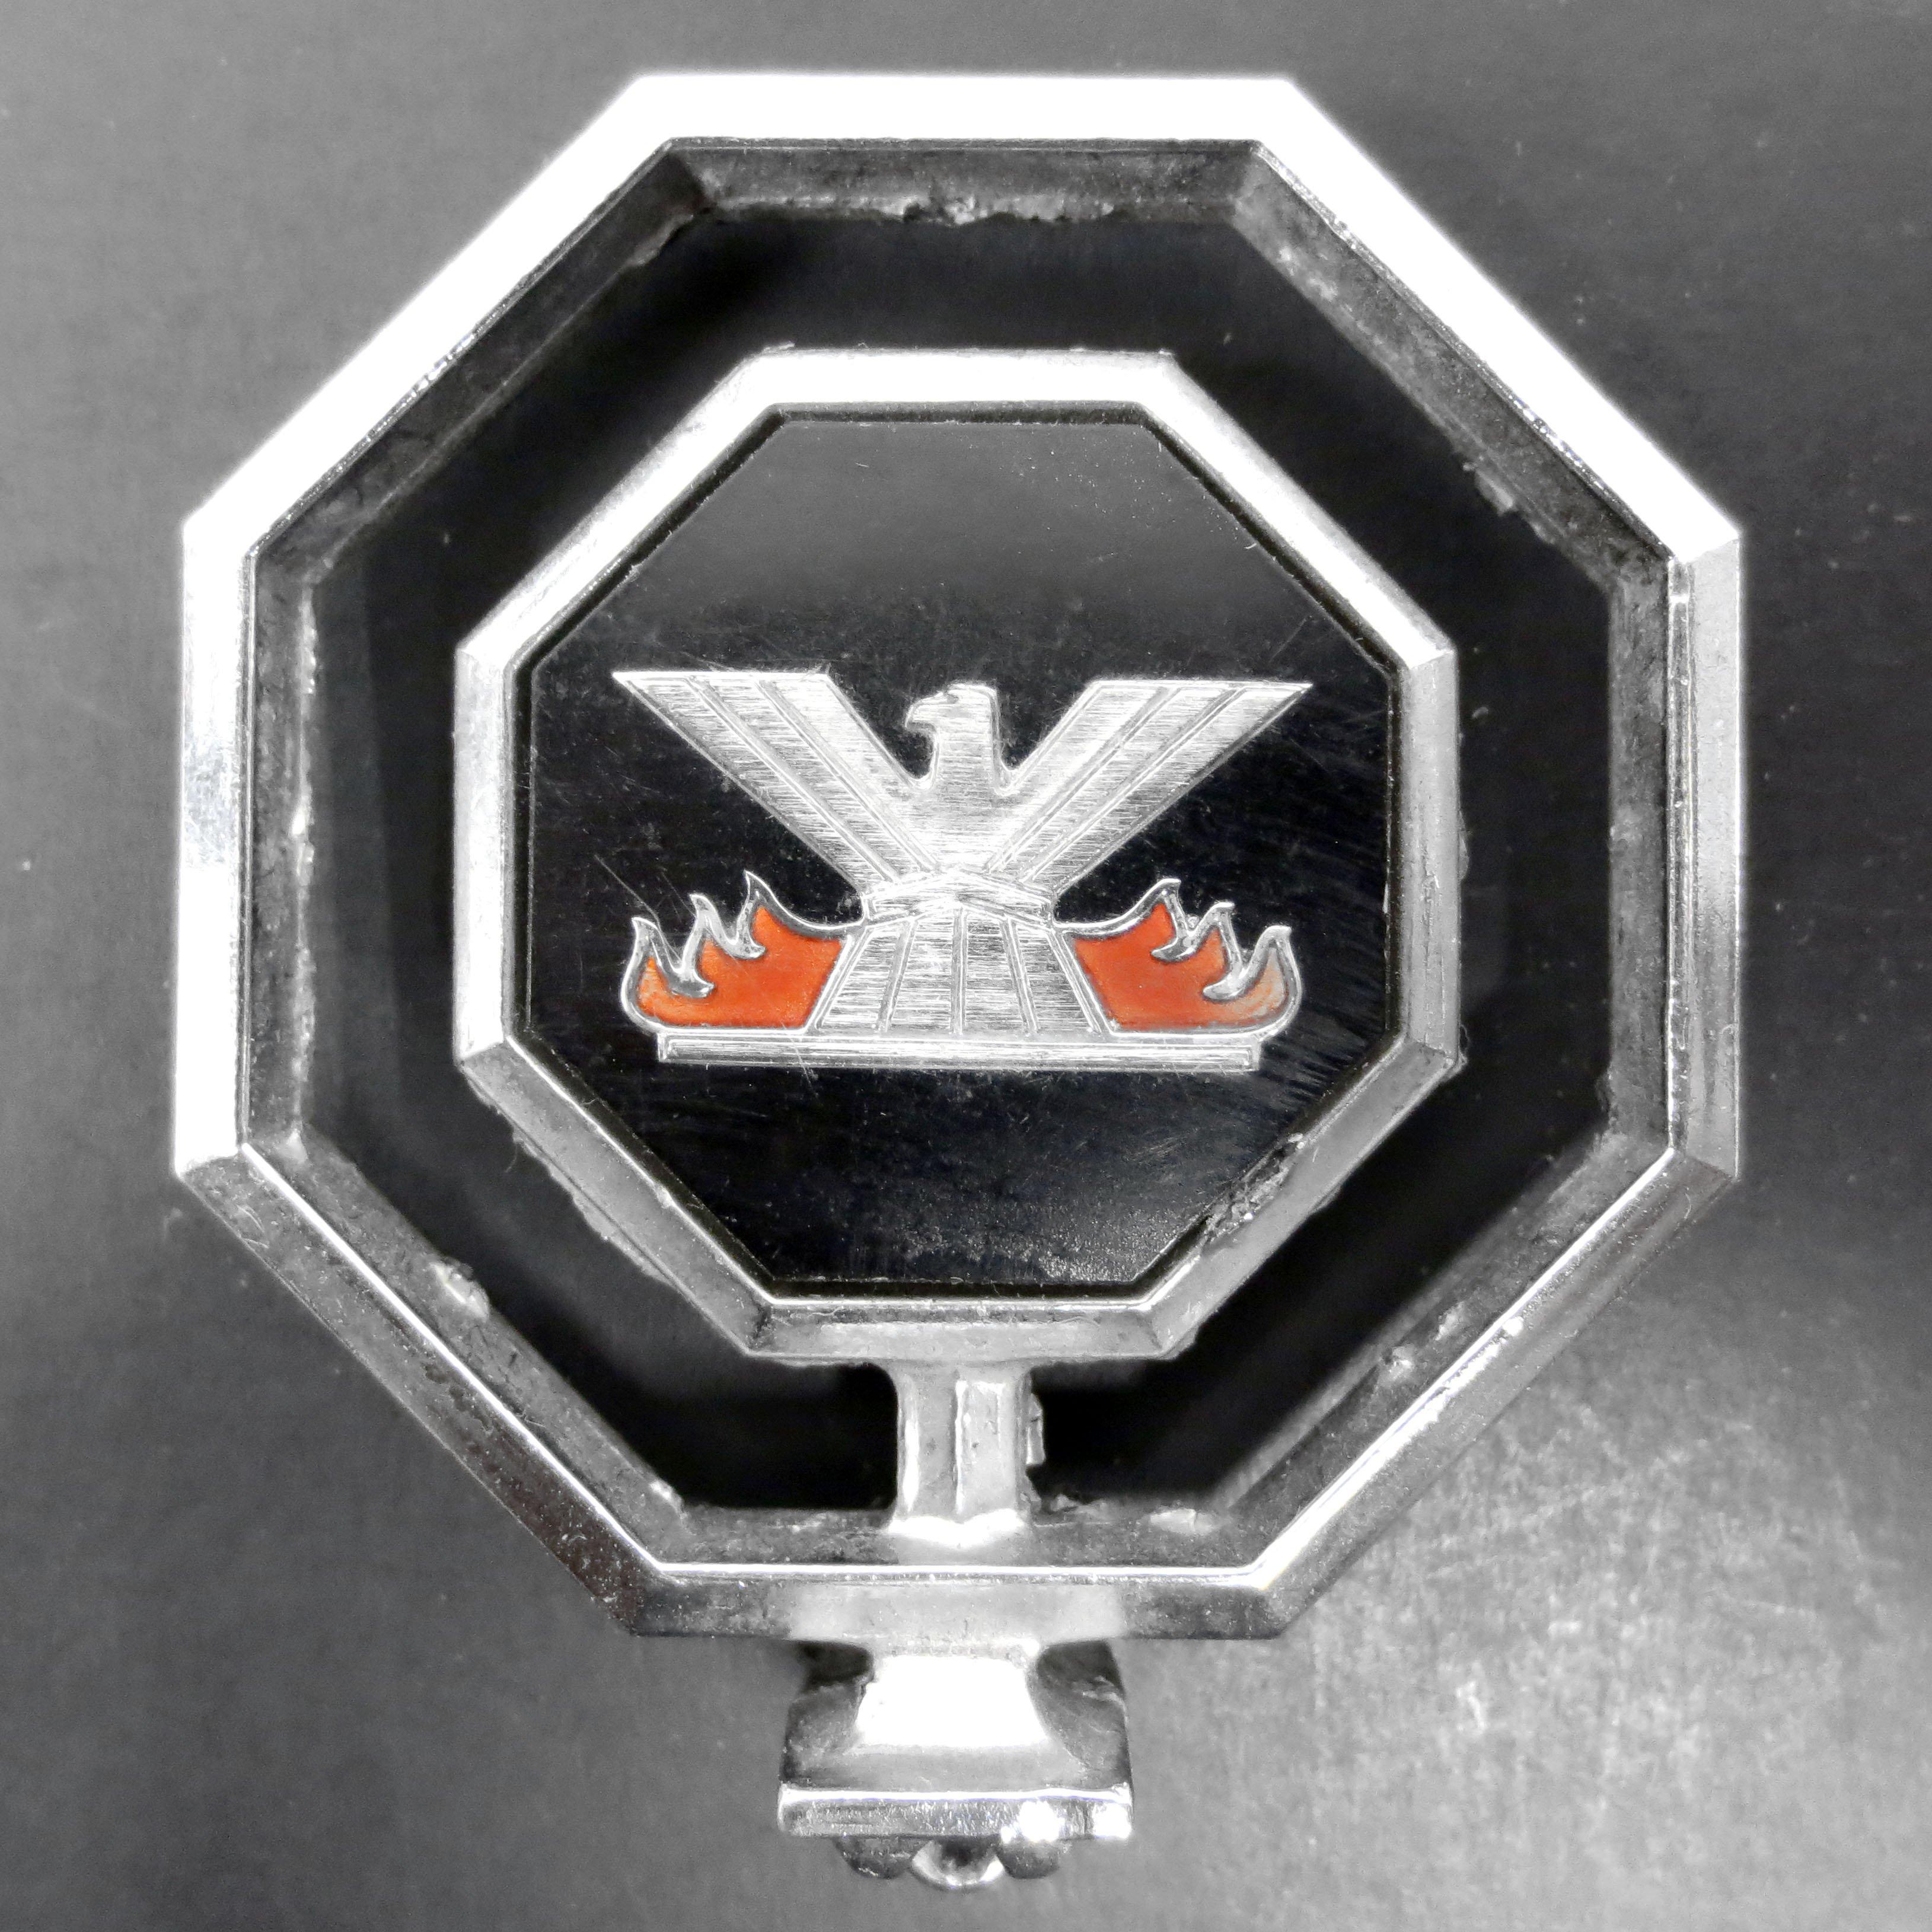 Vintage Pontiac Phoenix Car Hood Ornament Header Emblem Badge 1977